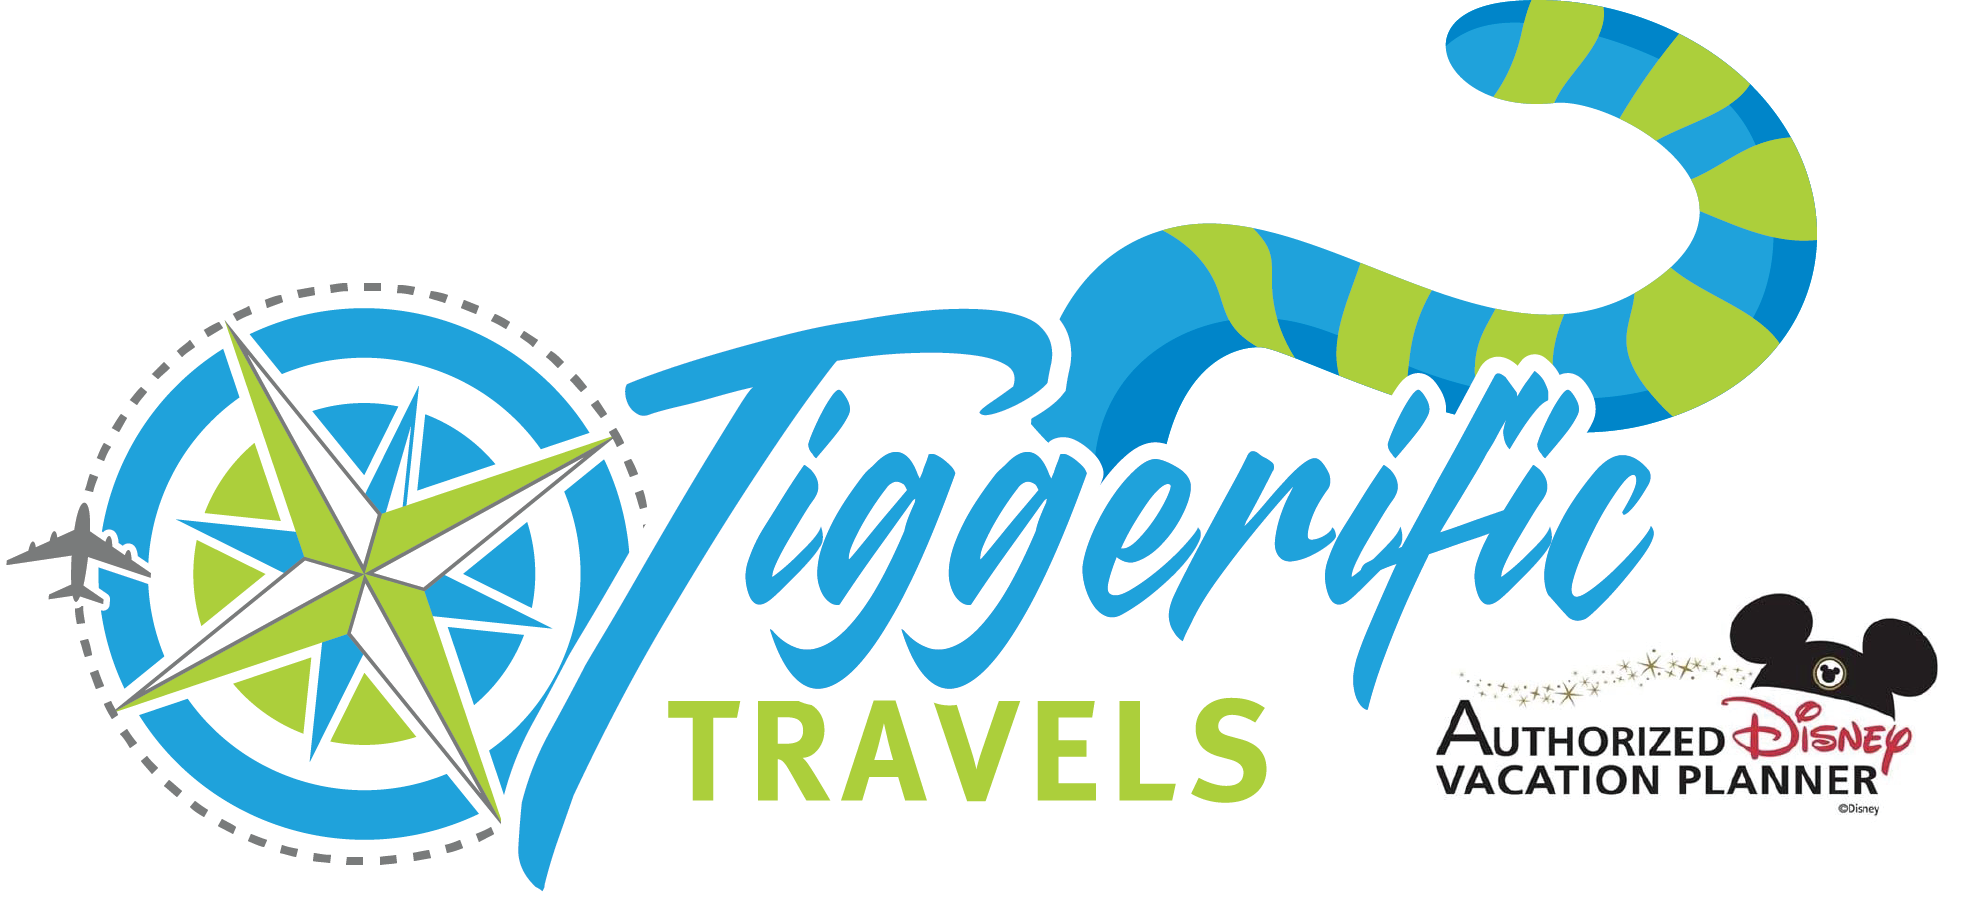 Tiggerific Travels